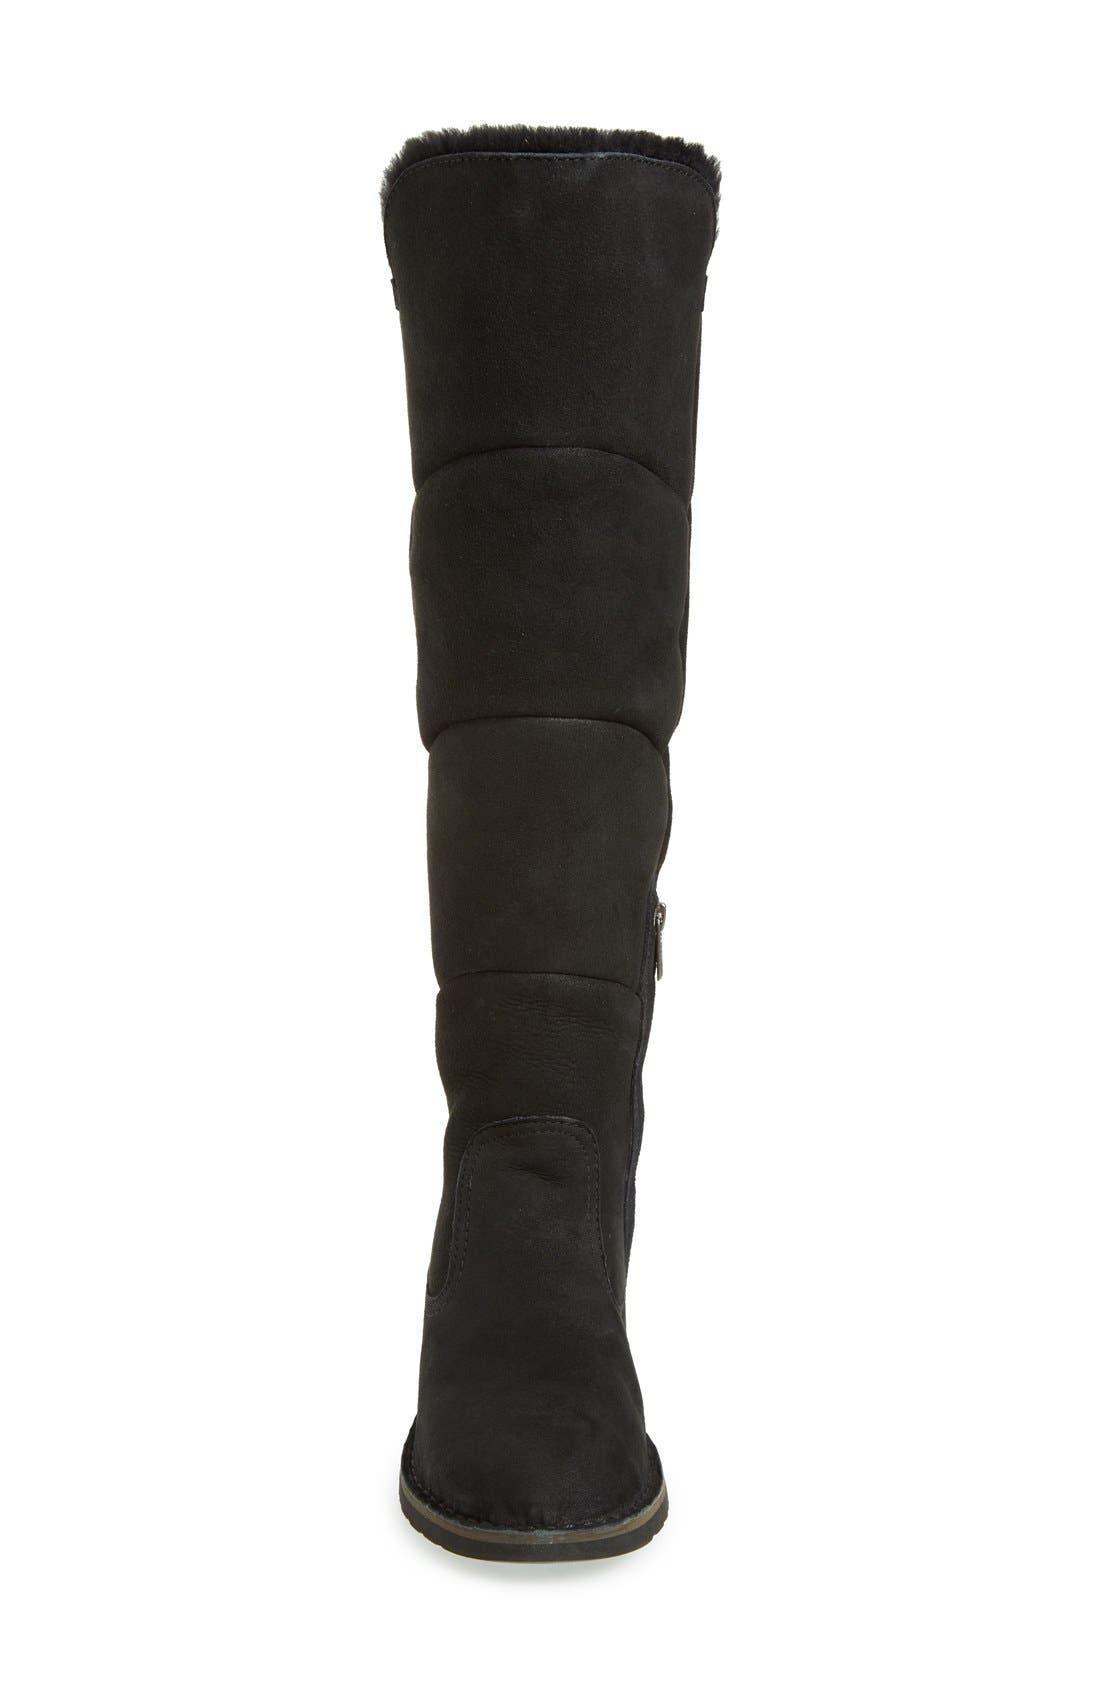 Alternate Image 3  - UGG® Sibley Over the Knee Water Resistant Boot (Women)